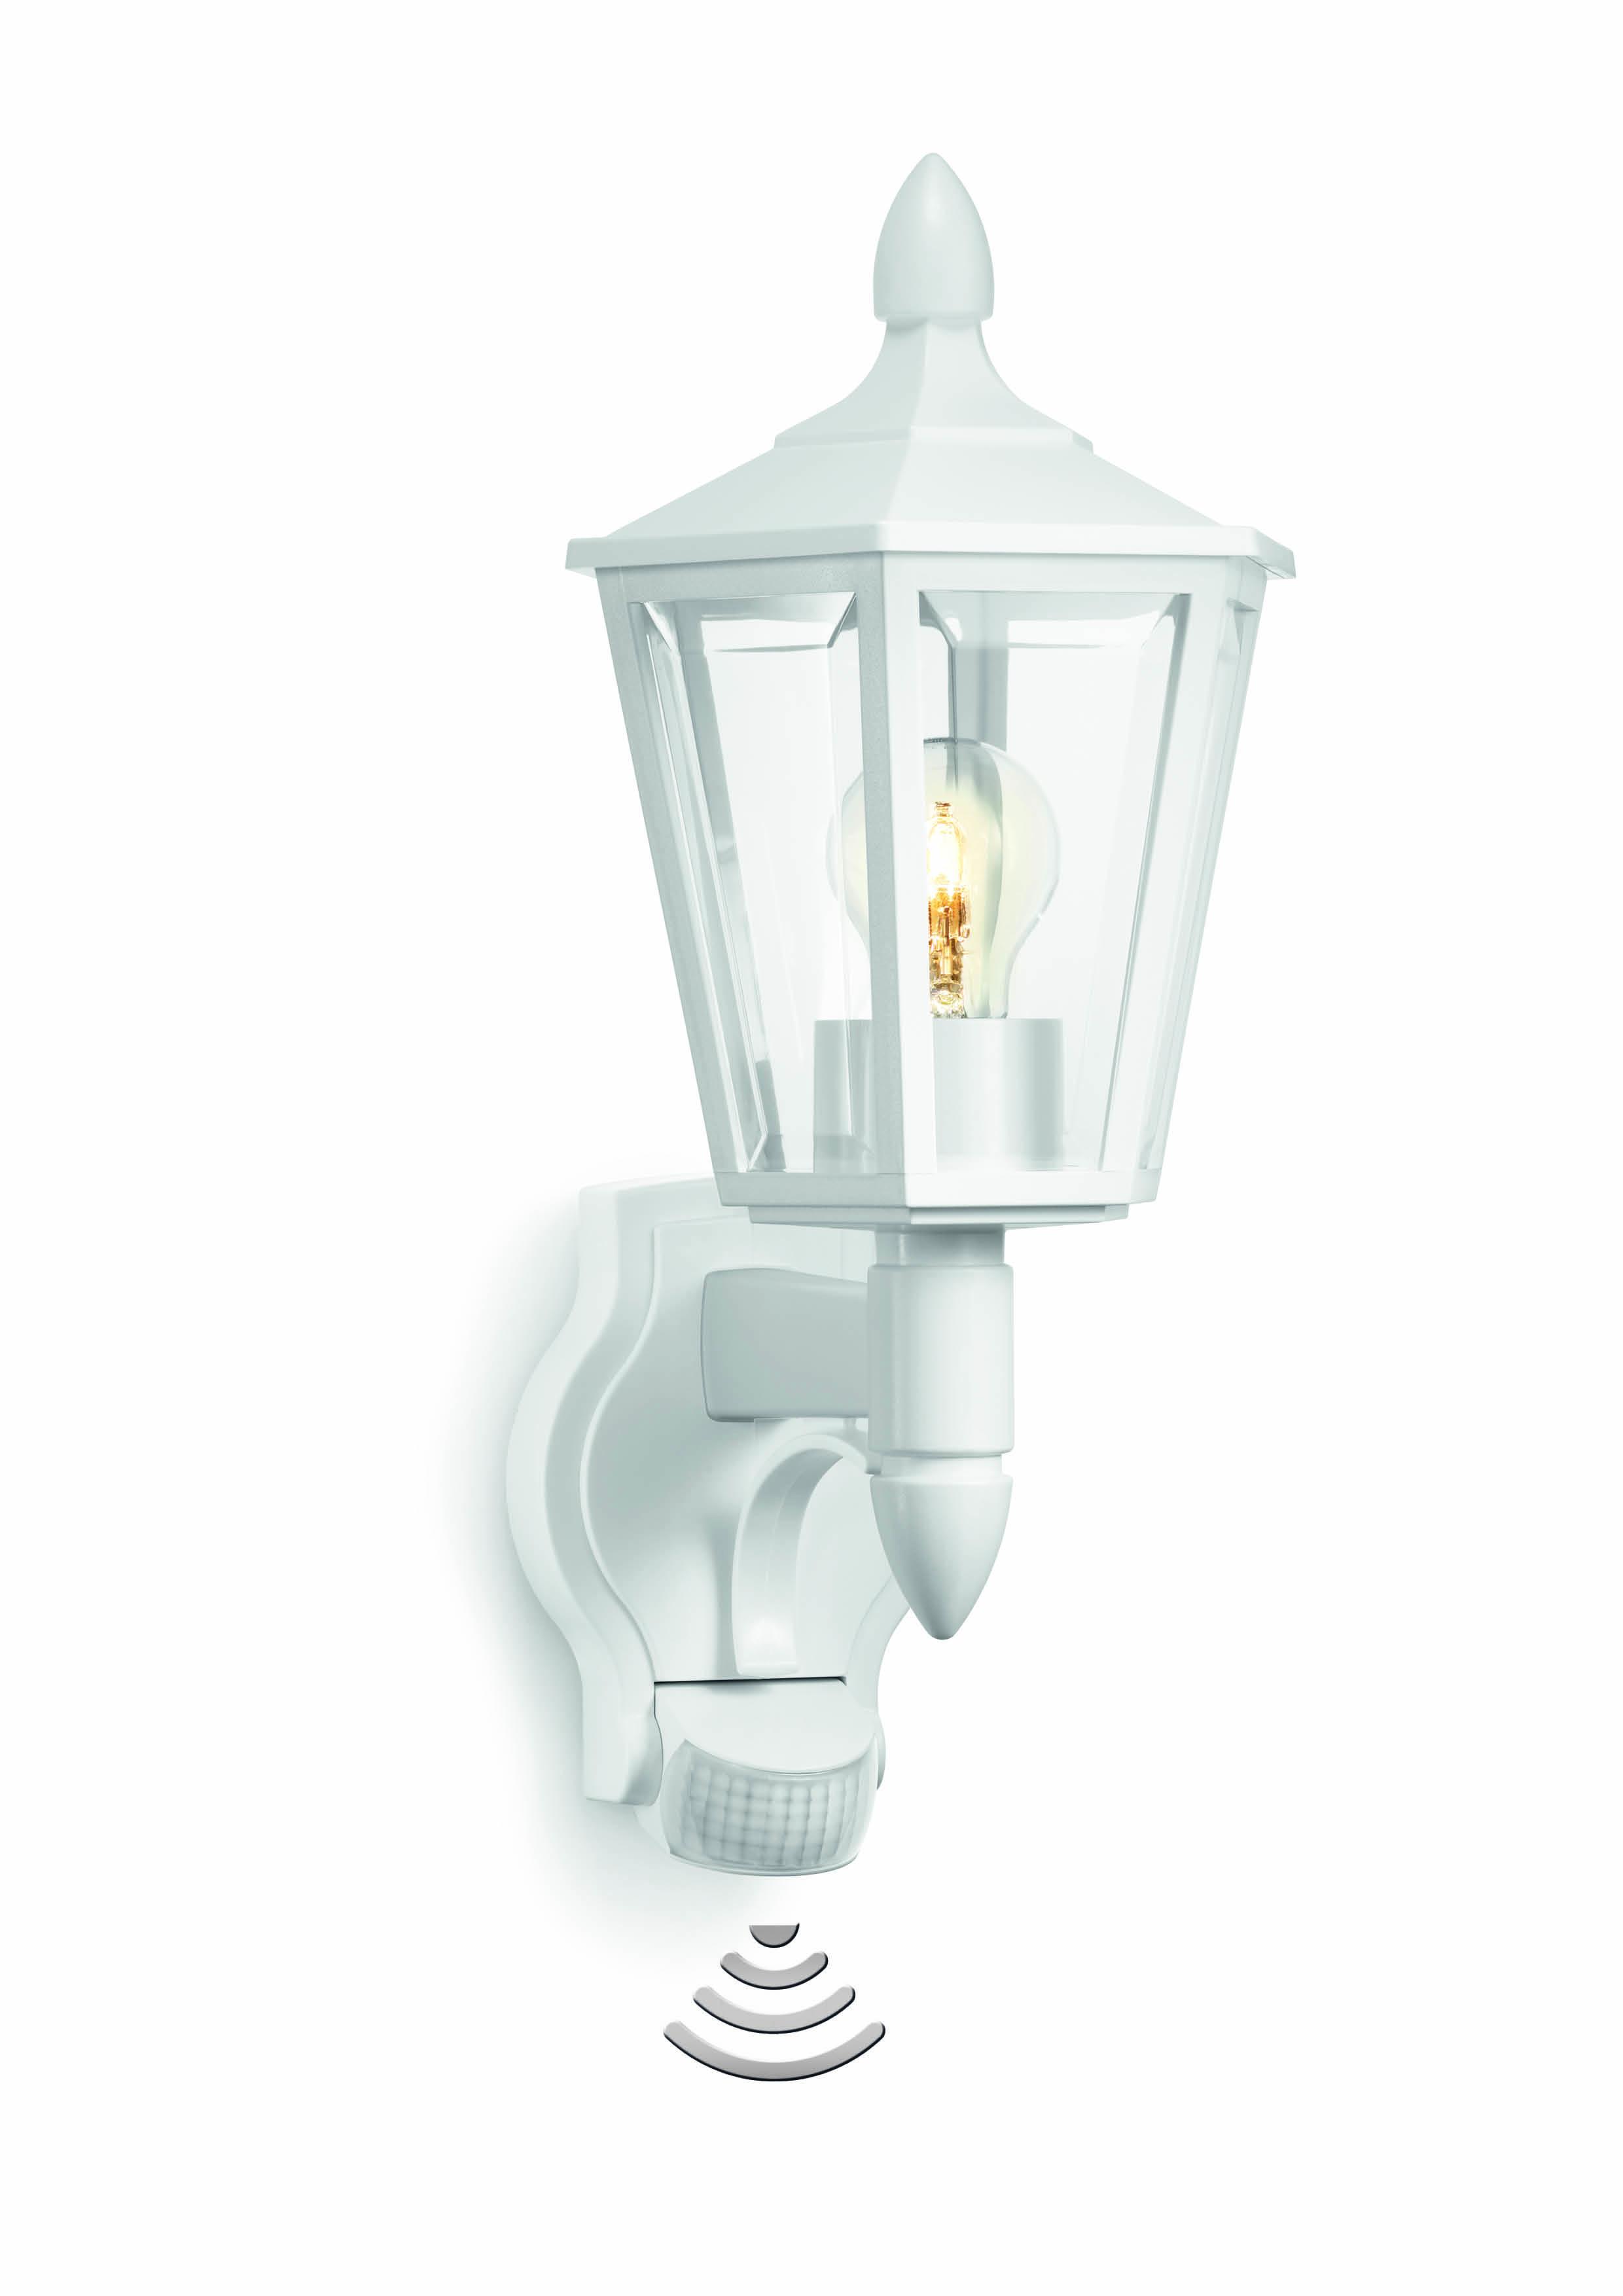 Lampen & Leuchten online bestellen